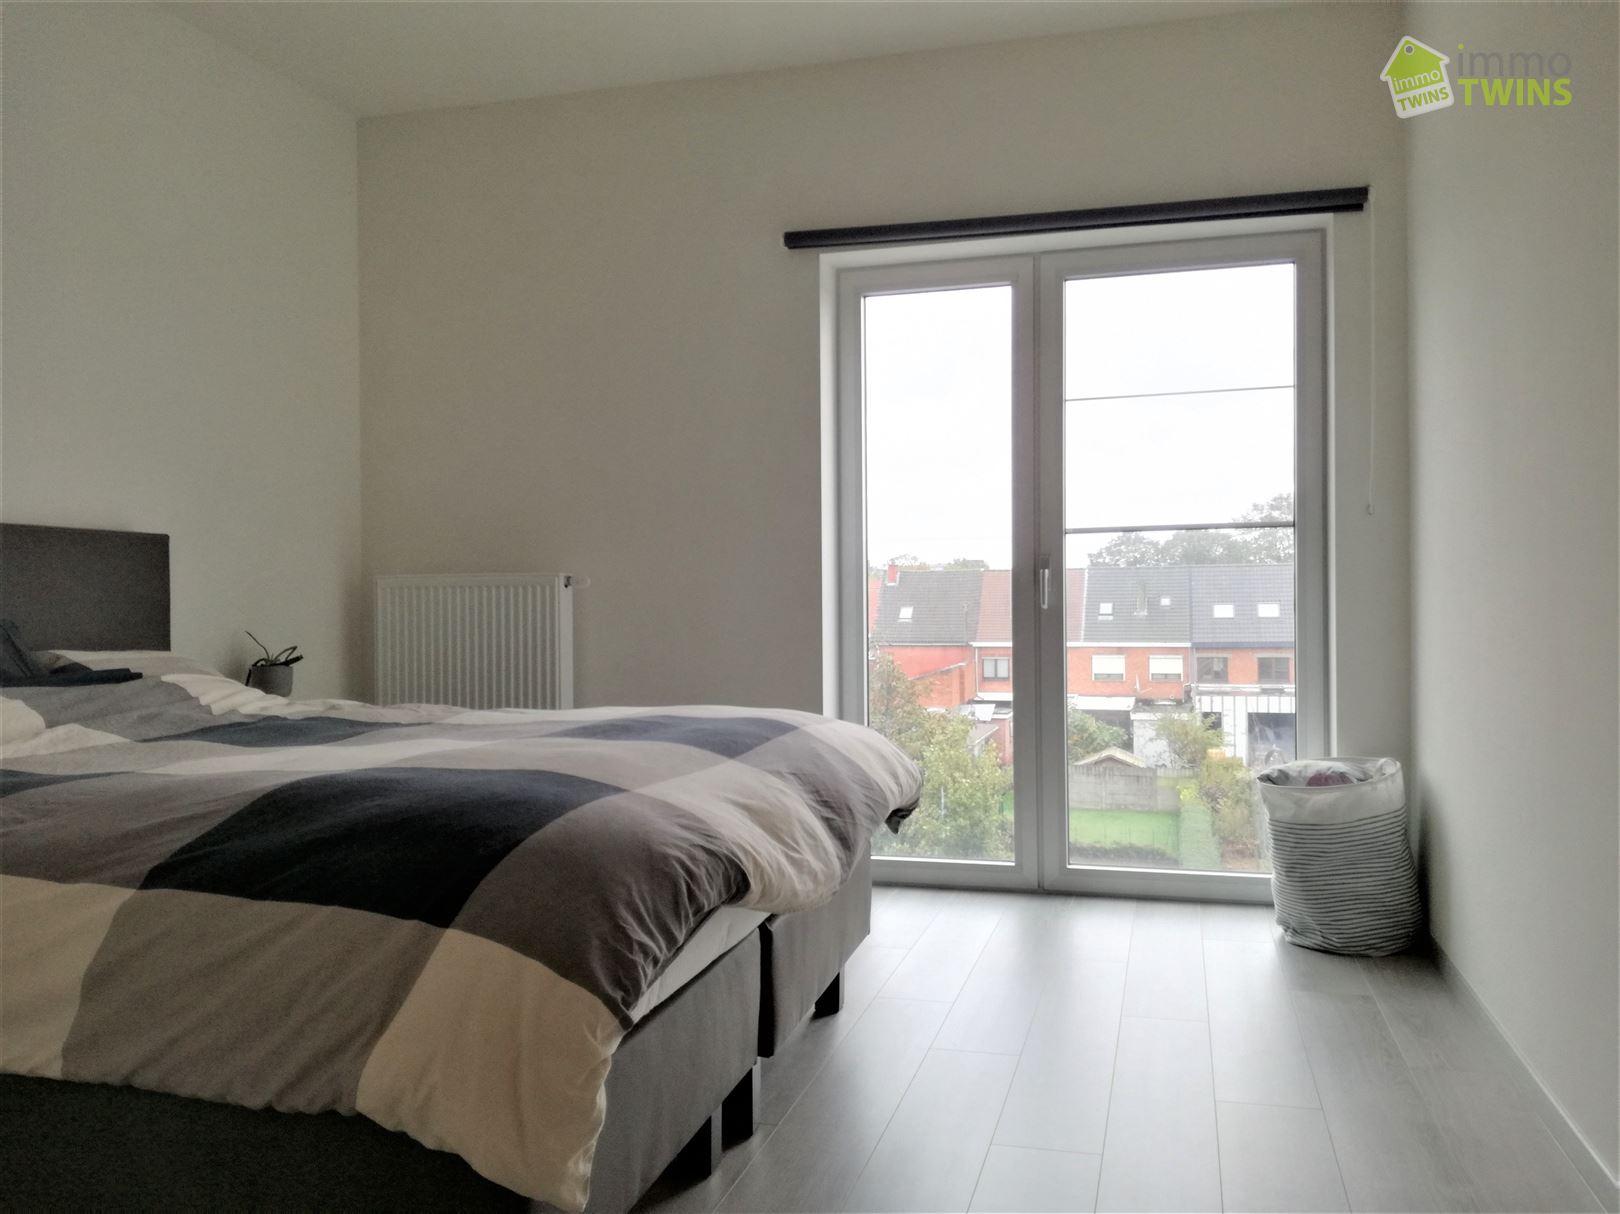 Foto 14 : Appartement te 9160 LOKEREN (België) - Prijs € 750